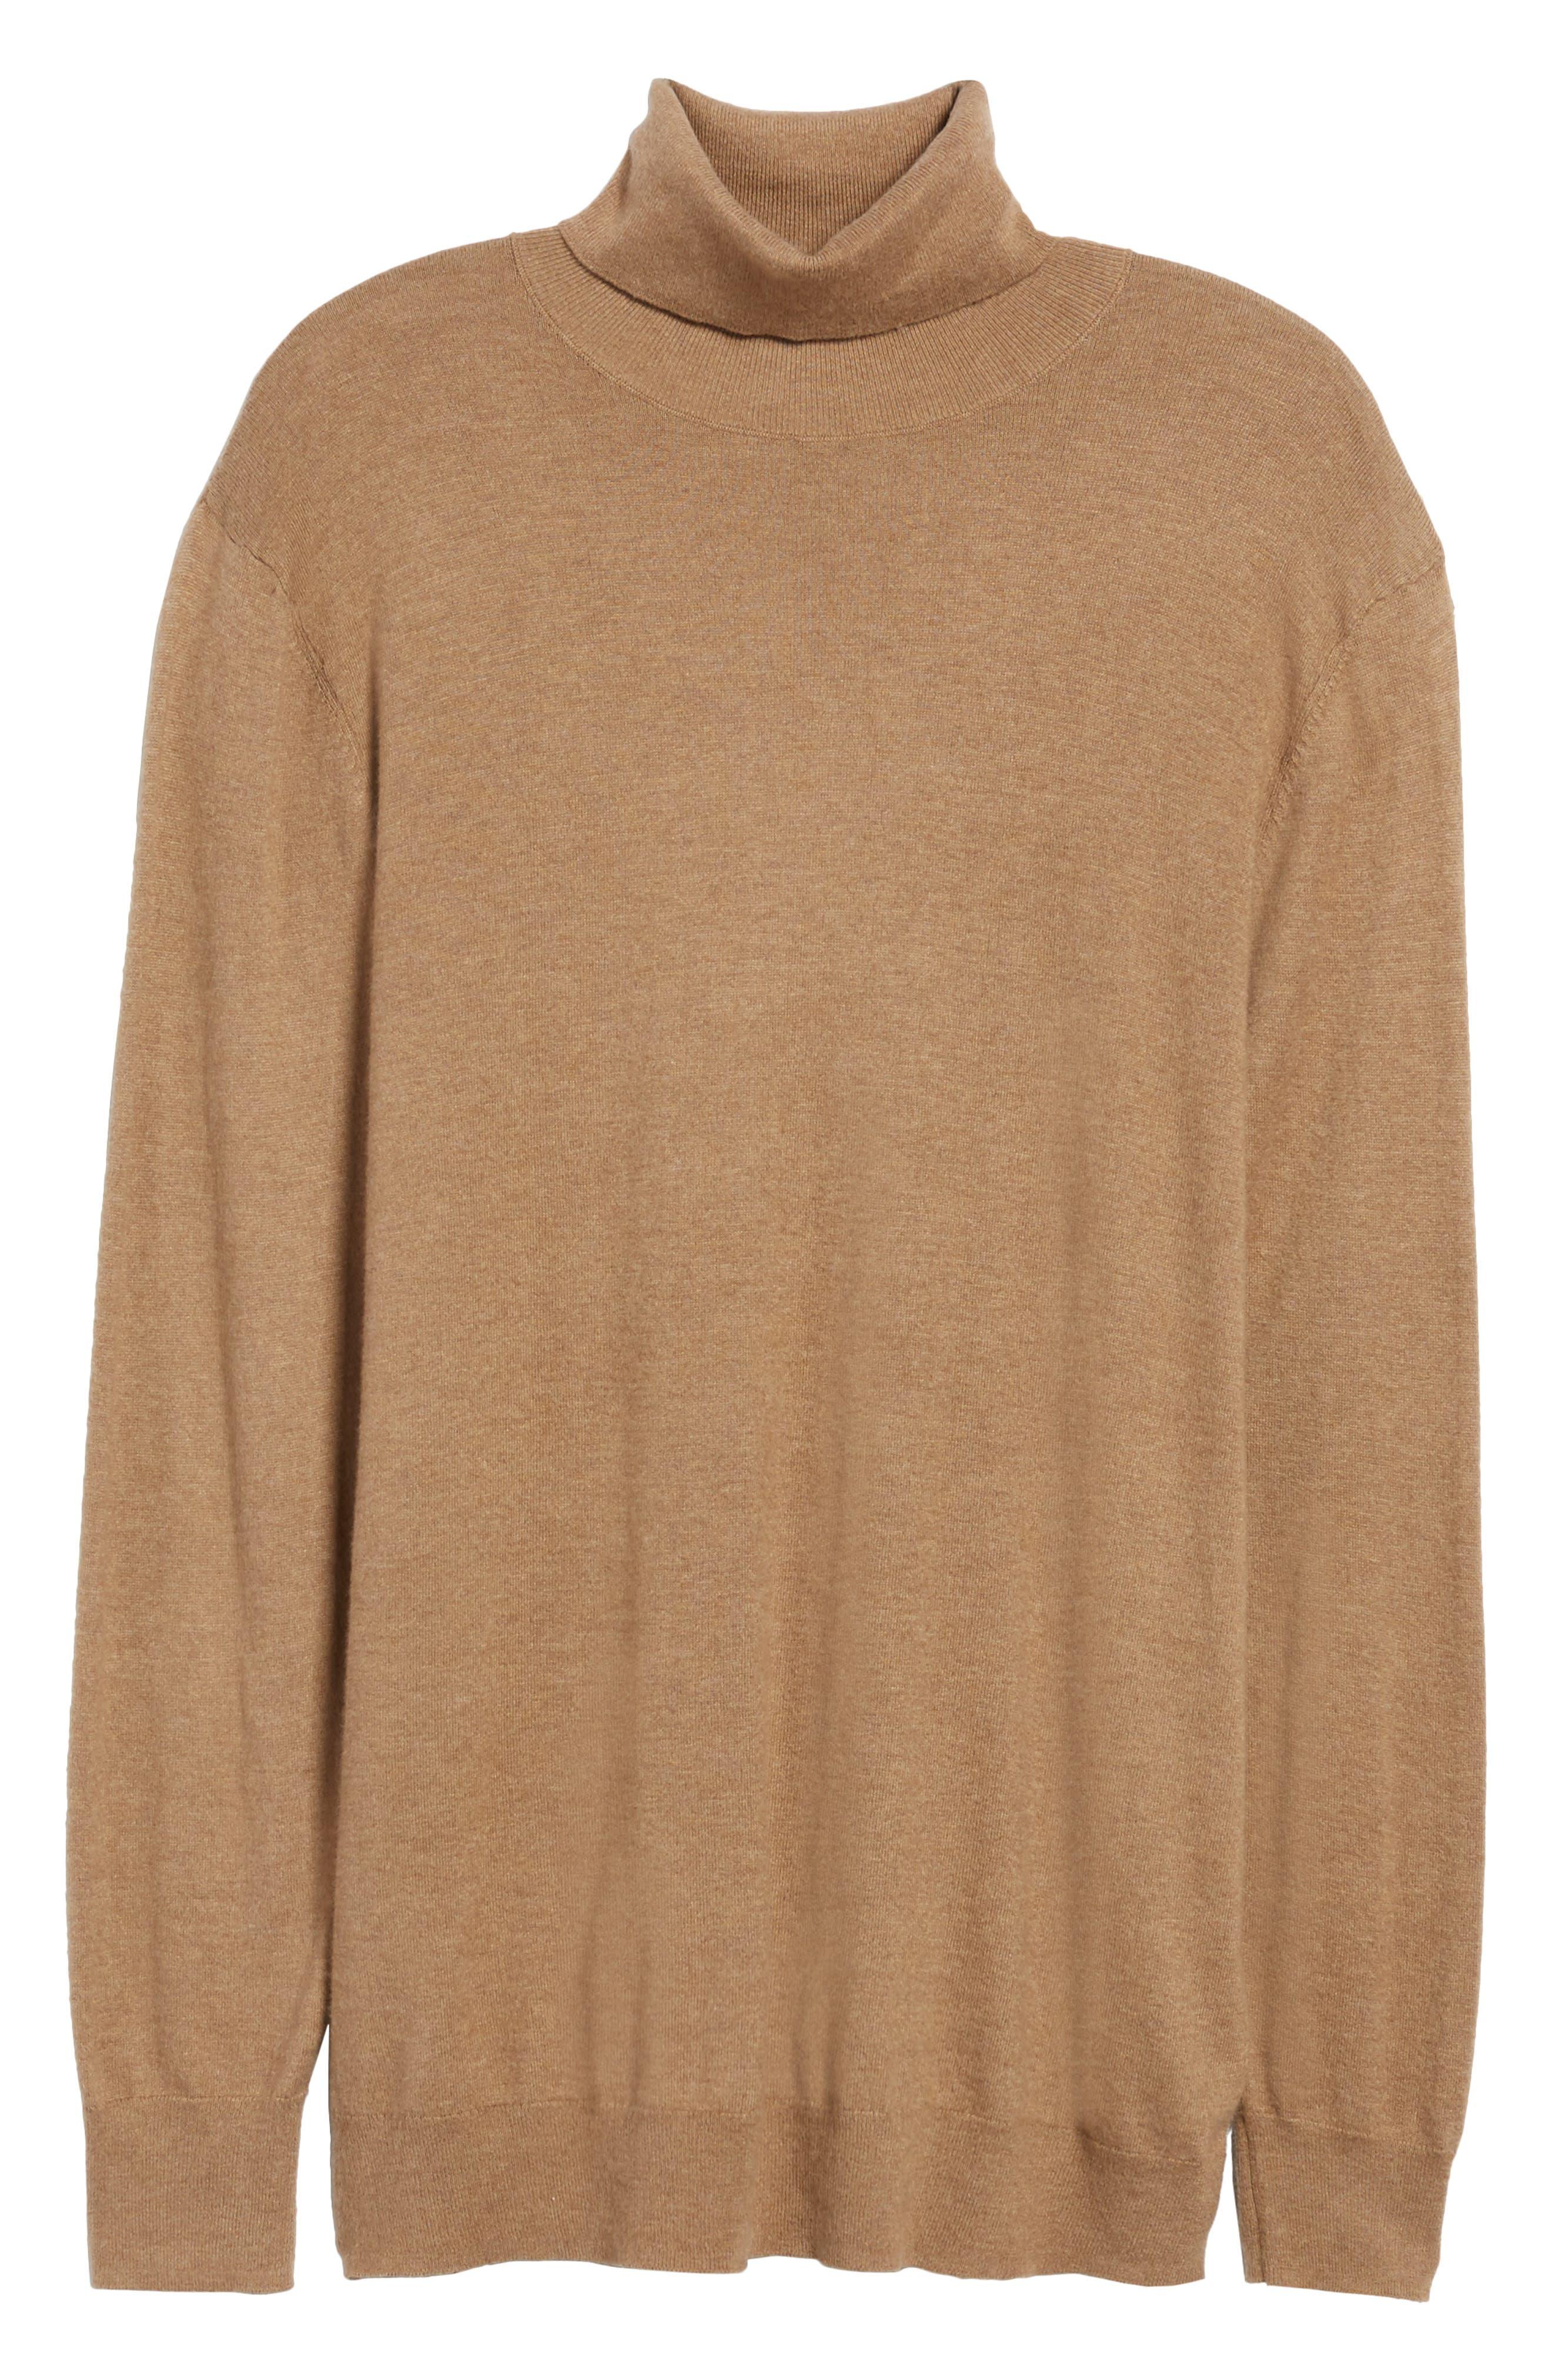 Boyfriend Turtleneck Sweater,                             Alternate thumbnail 18, color,